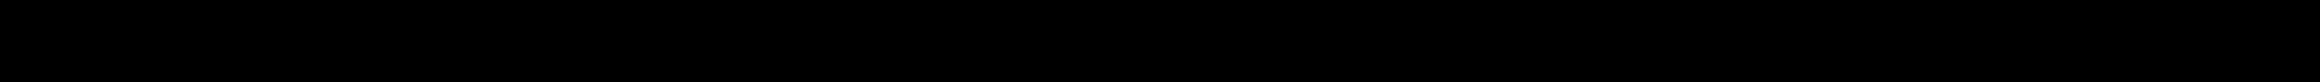 MANN-FILTER 5431 605, 5443 746, 5443 746 C, 5476 207, 5491 133 Ölfilter